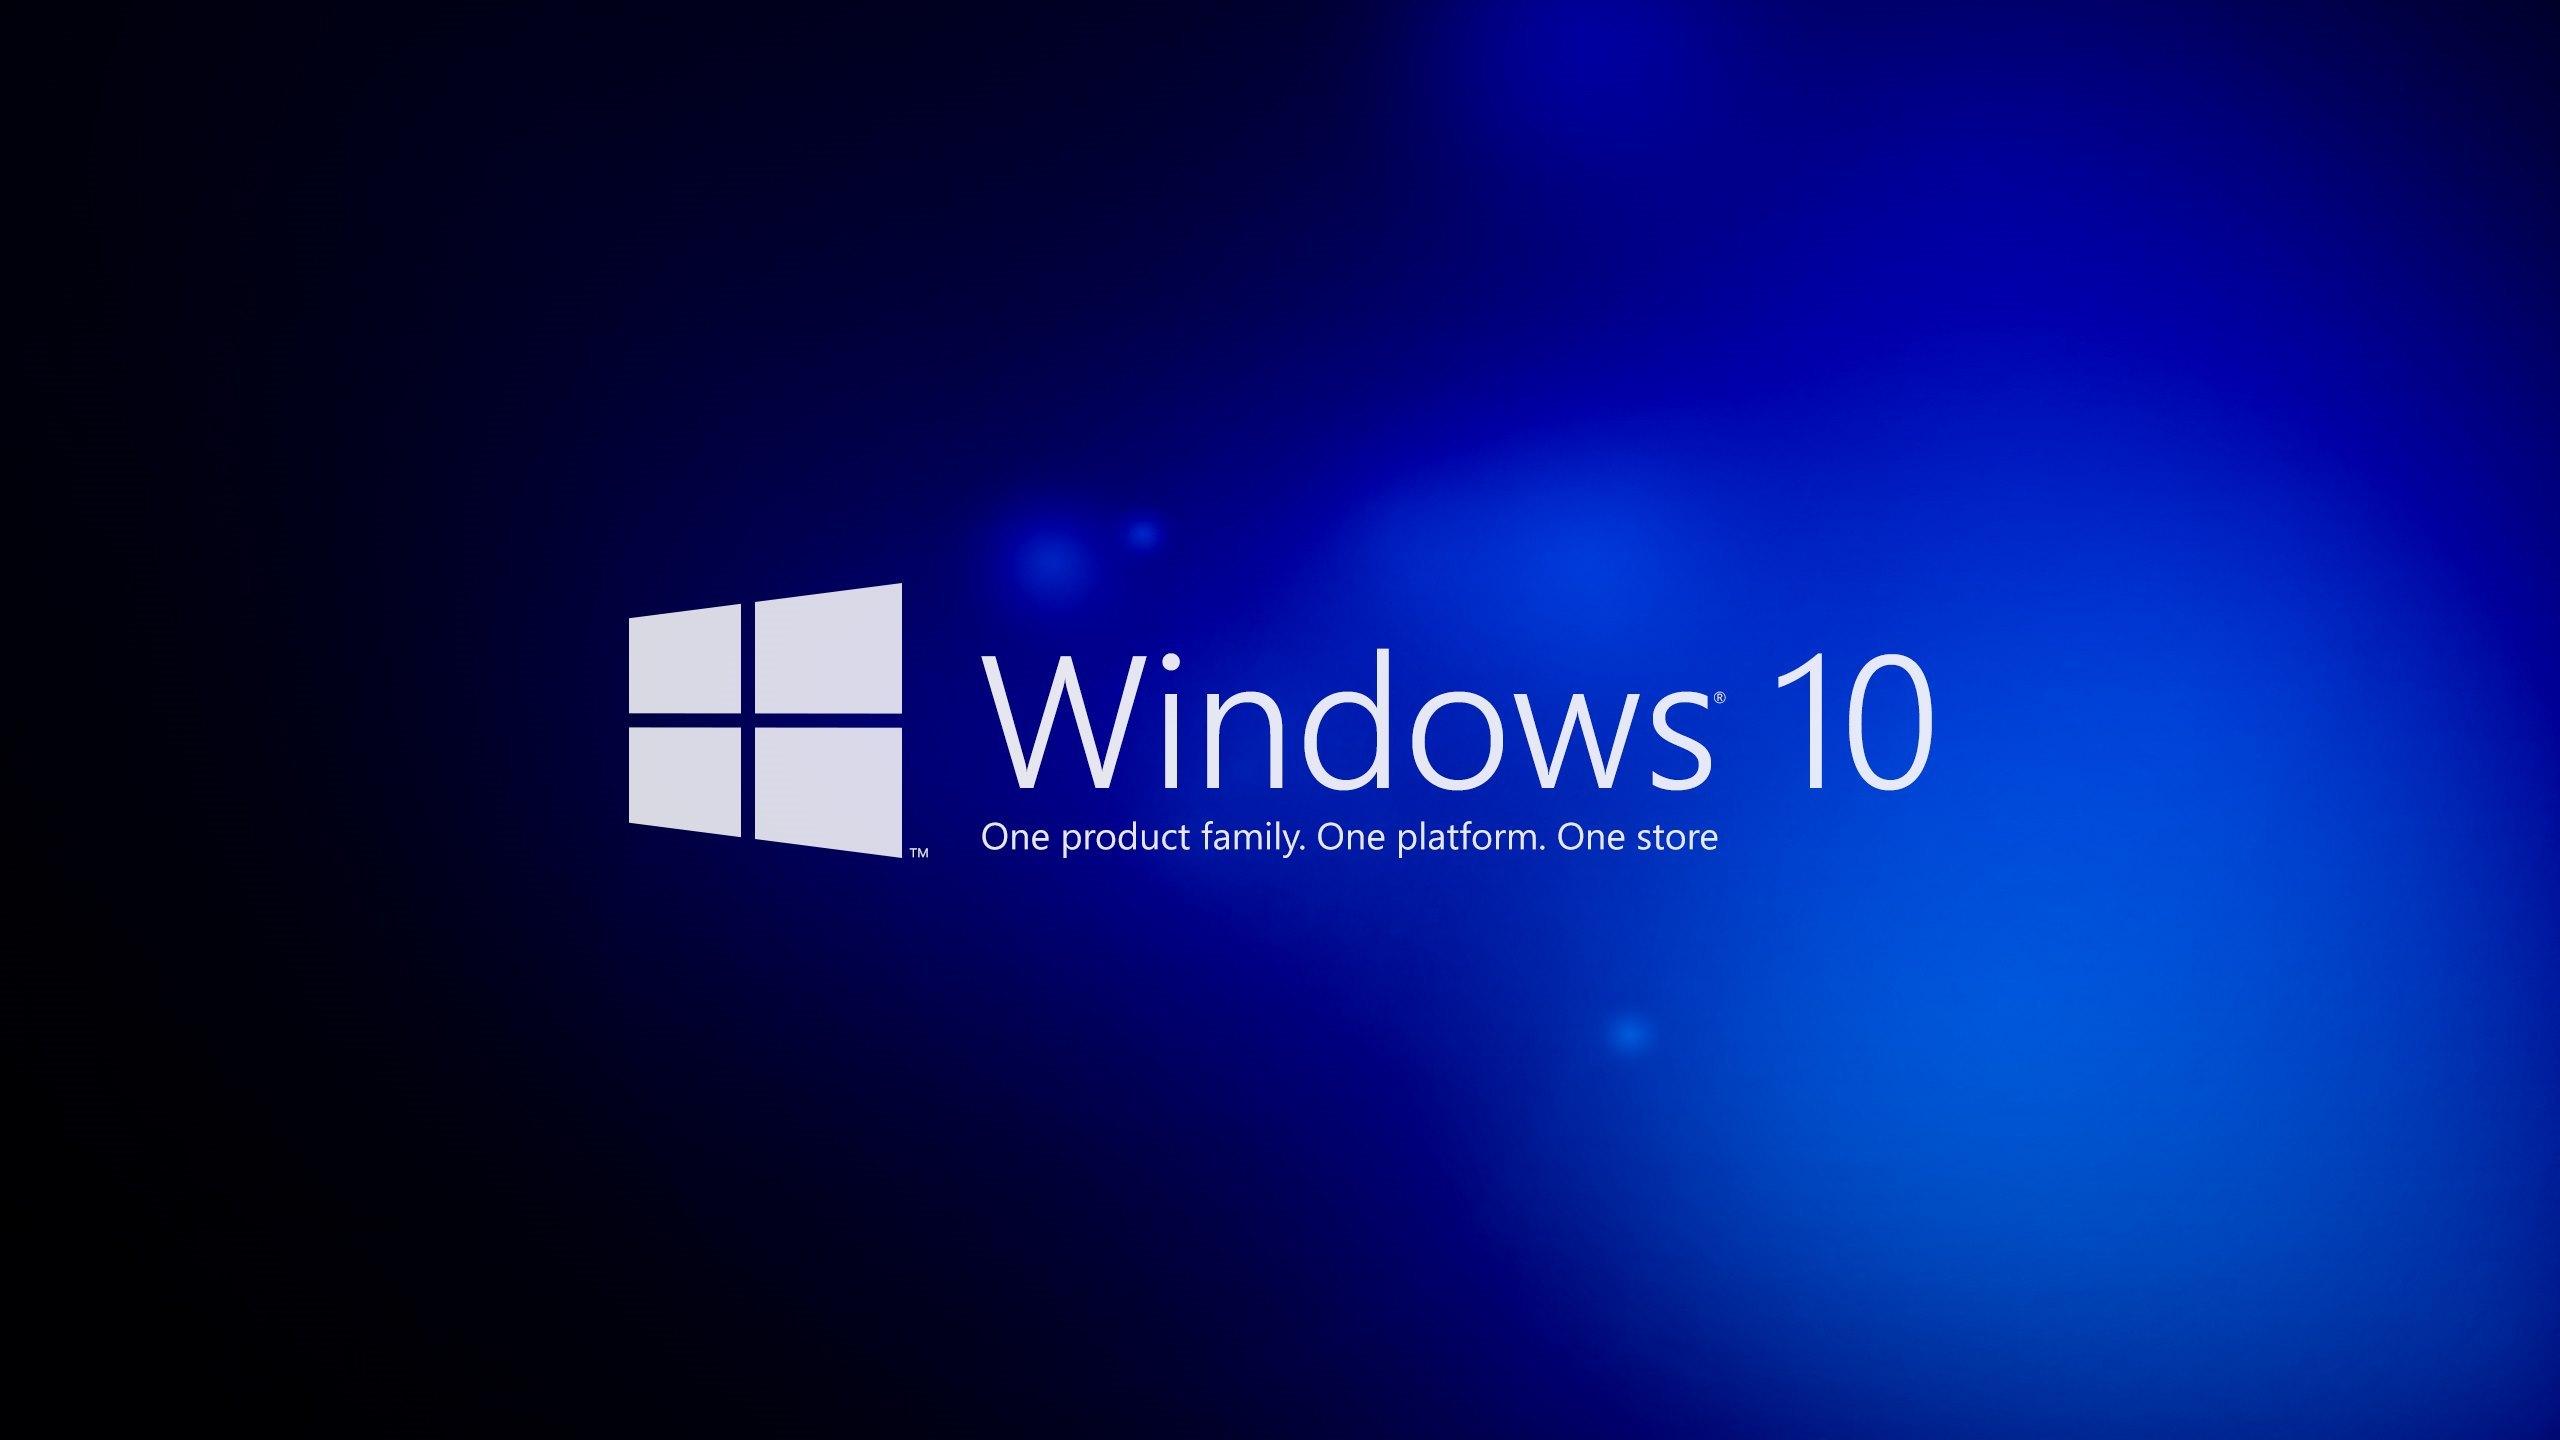 Windows 10 Wallpapers Desktop Backgrounds   7   HD Wallpapers 2560x1440